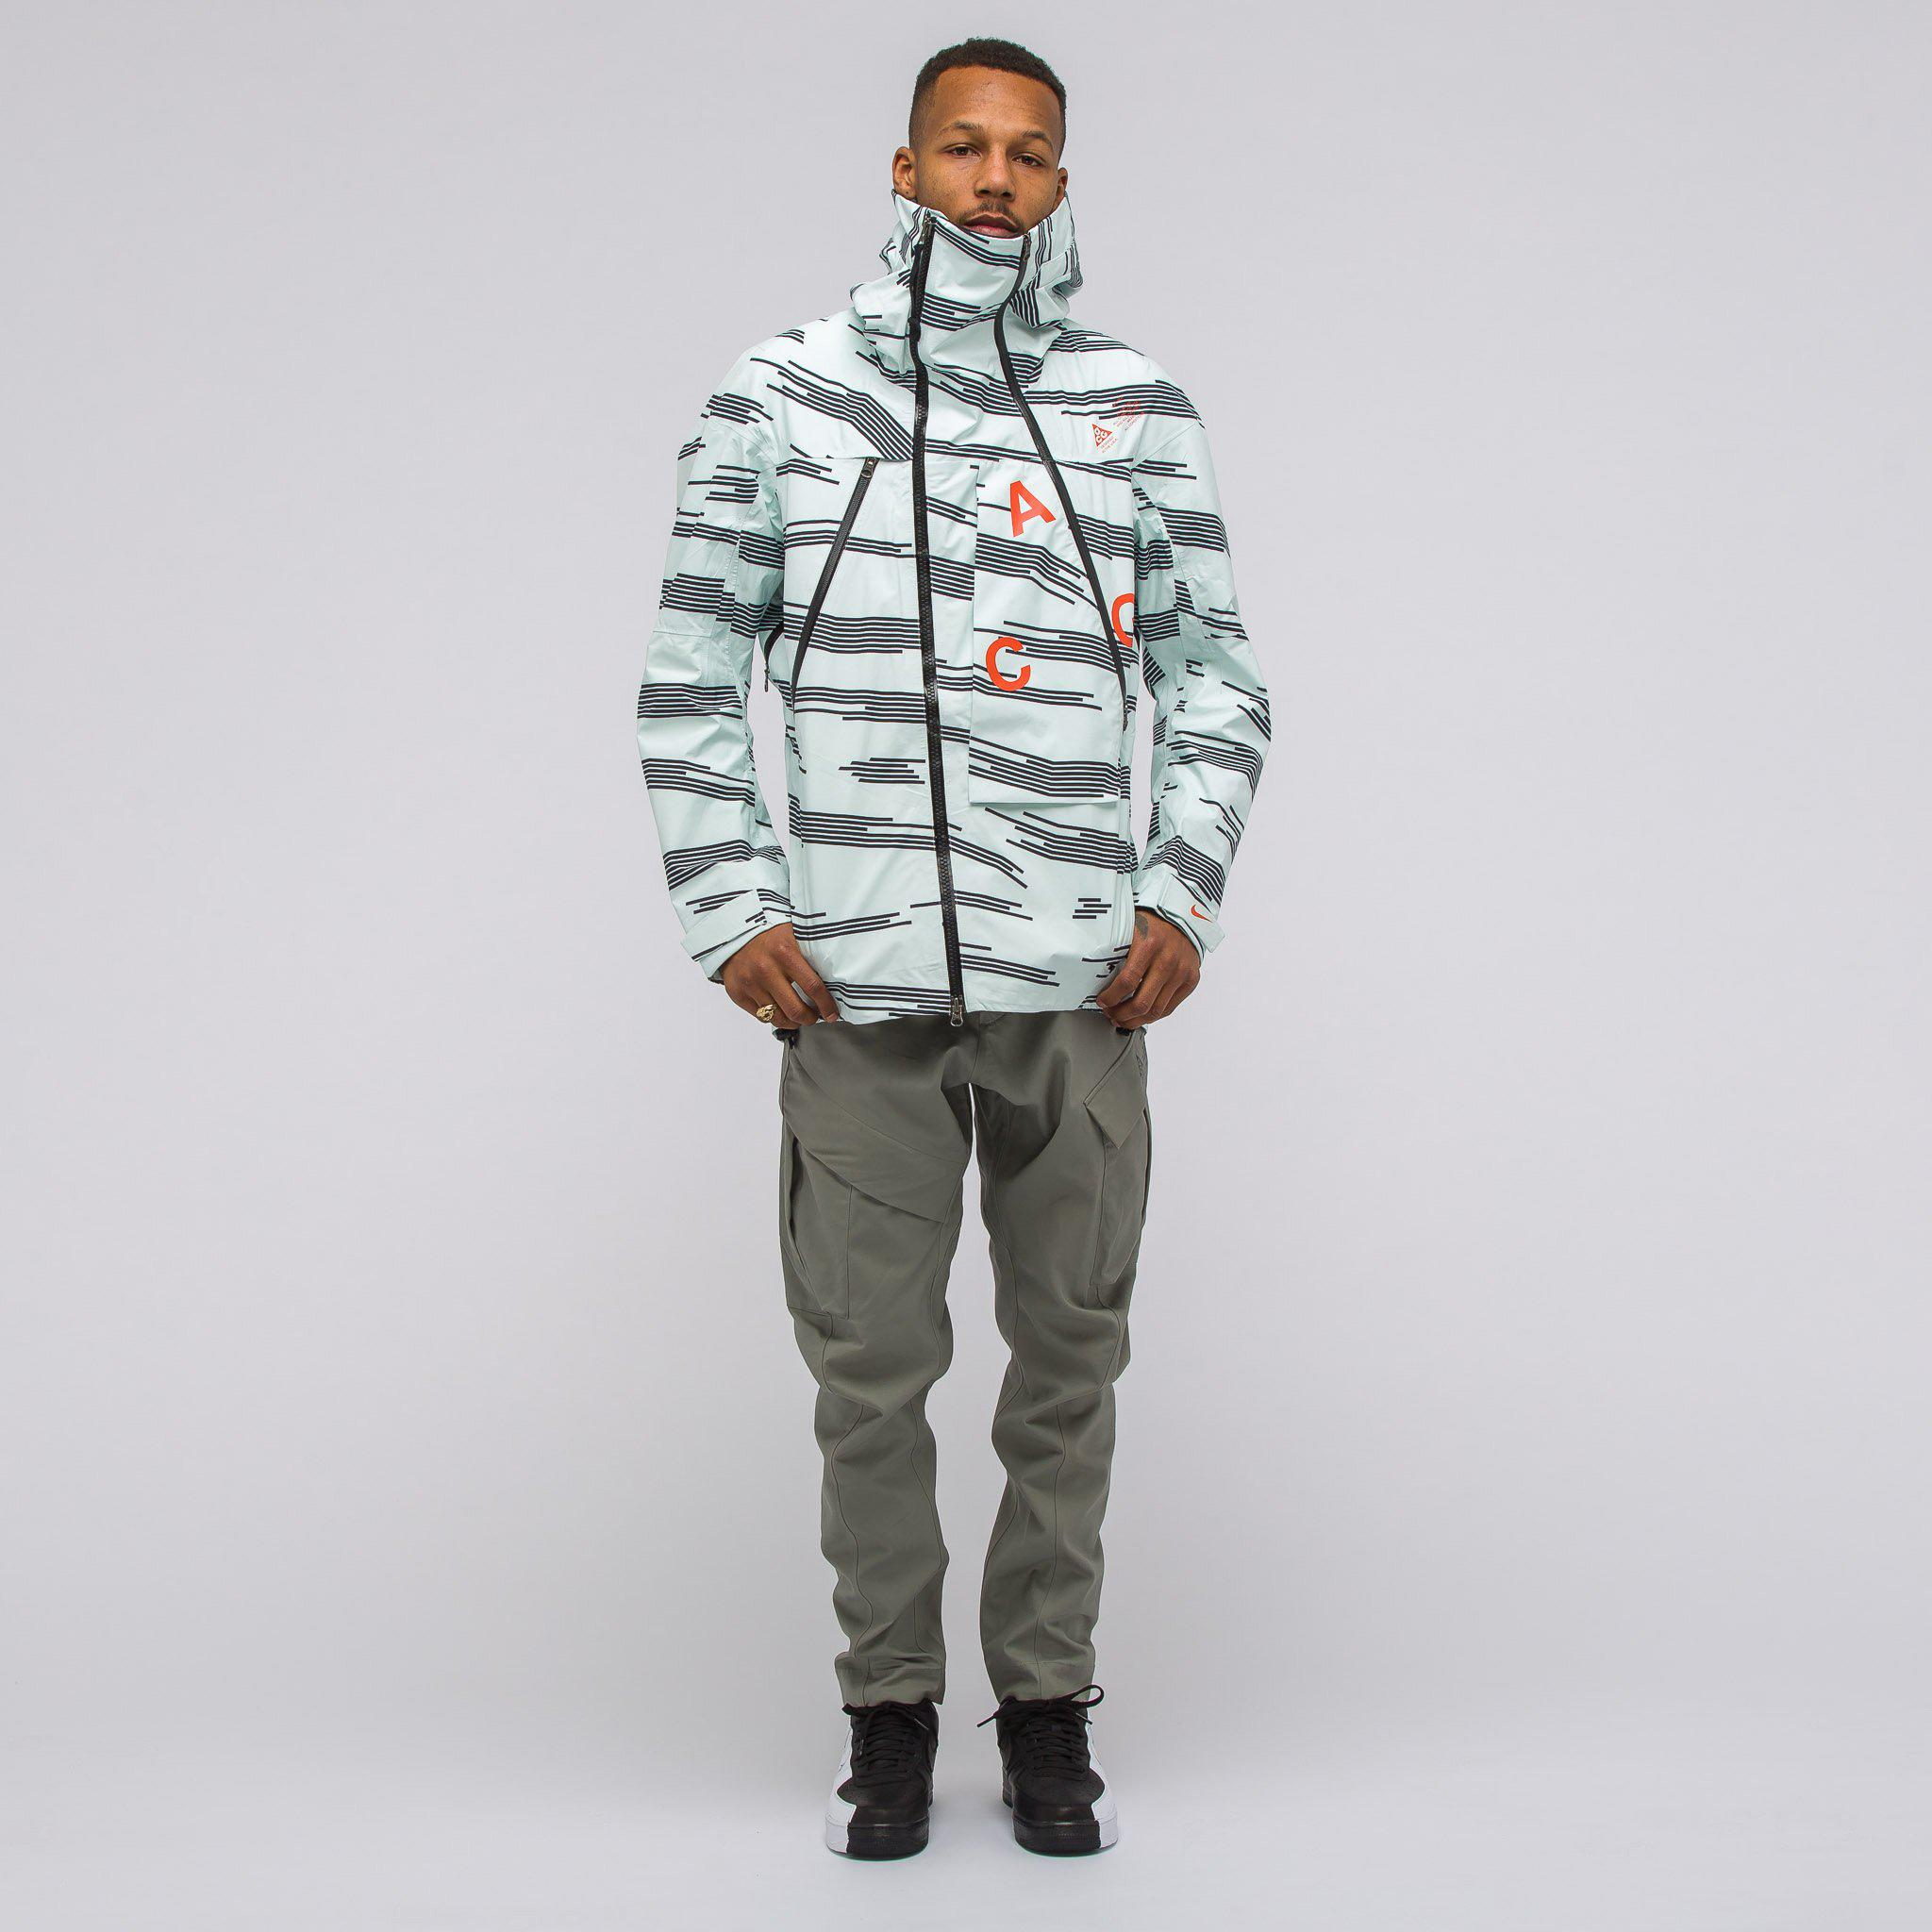 Temblar Lágrimas enlazar  Nike Synthetic Acg Alpine Jacket In Barely Green for Men - Lyst